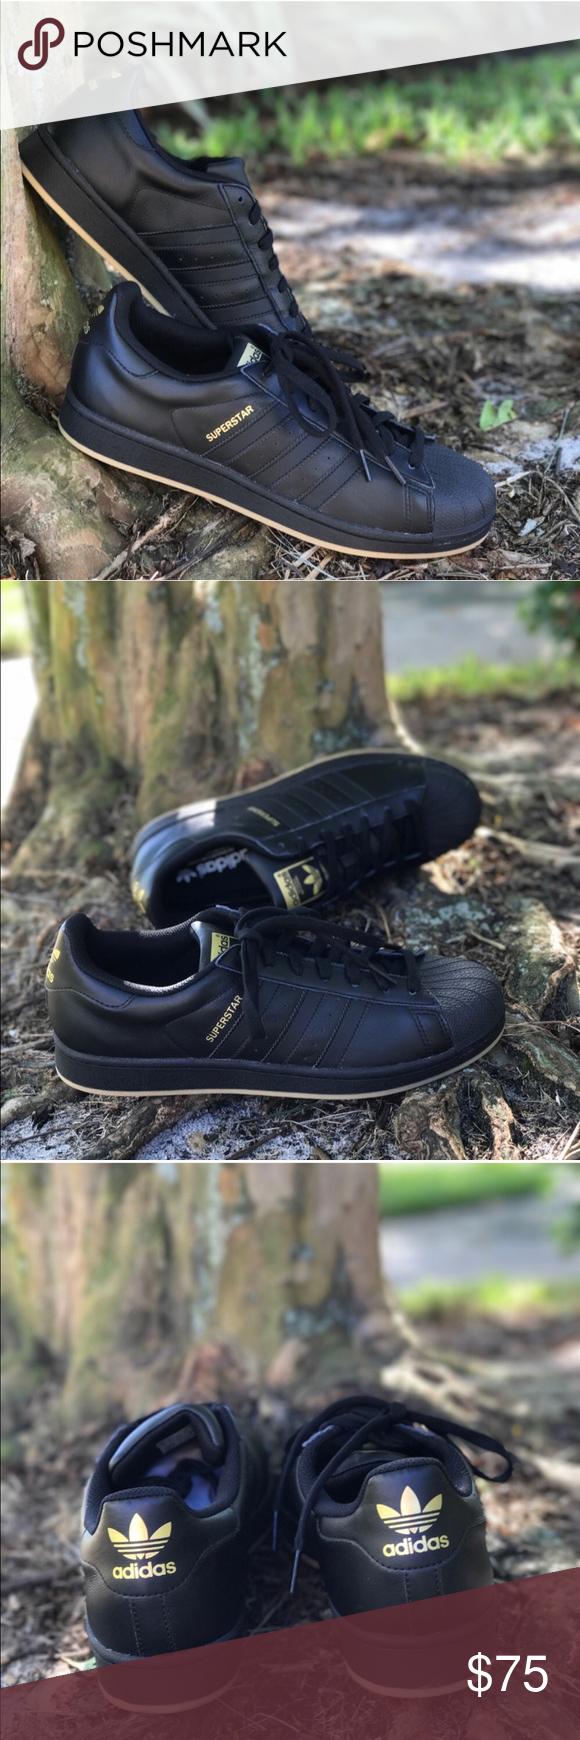 Nwt Adidas Superstar Nero / Oro Adidas Originali M Stile, Adidas